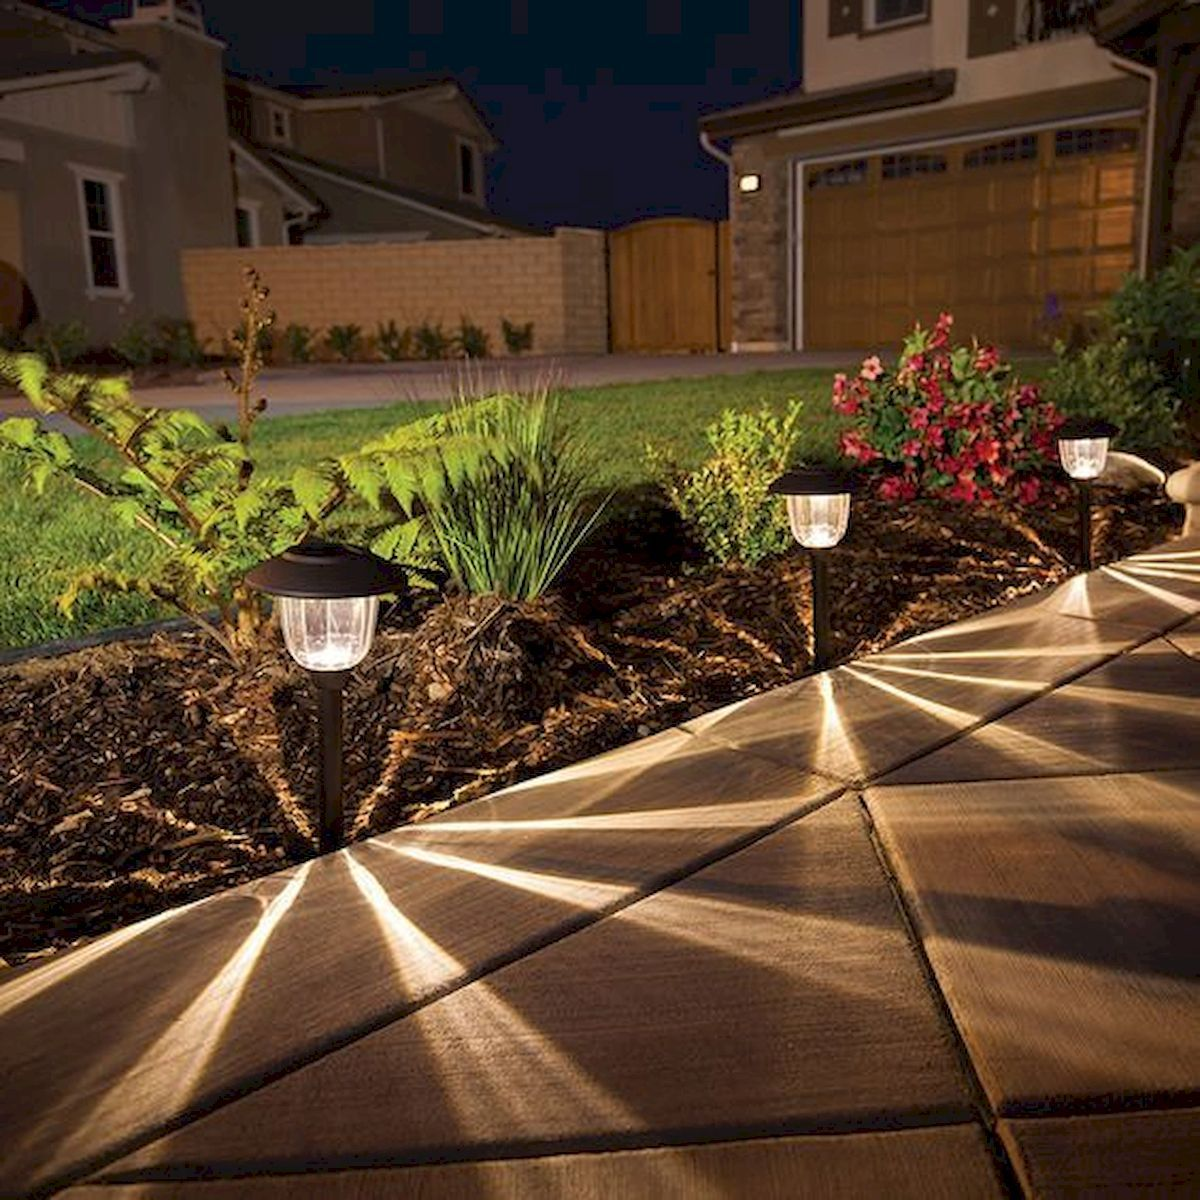 55 Stunning Garden Lighting Design Ideas And Remodel With Images Garden Lighting Design Outdoor Landscape Lighting Outdoor Garden Lighting